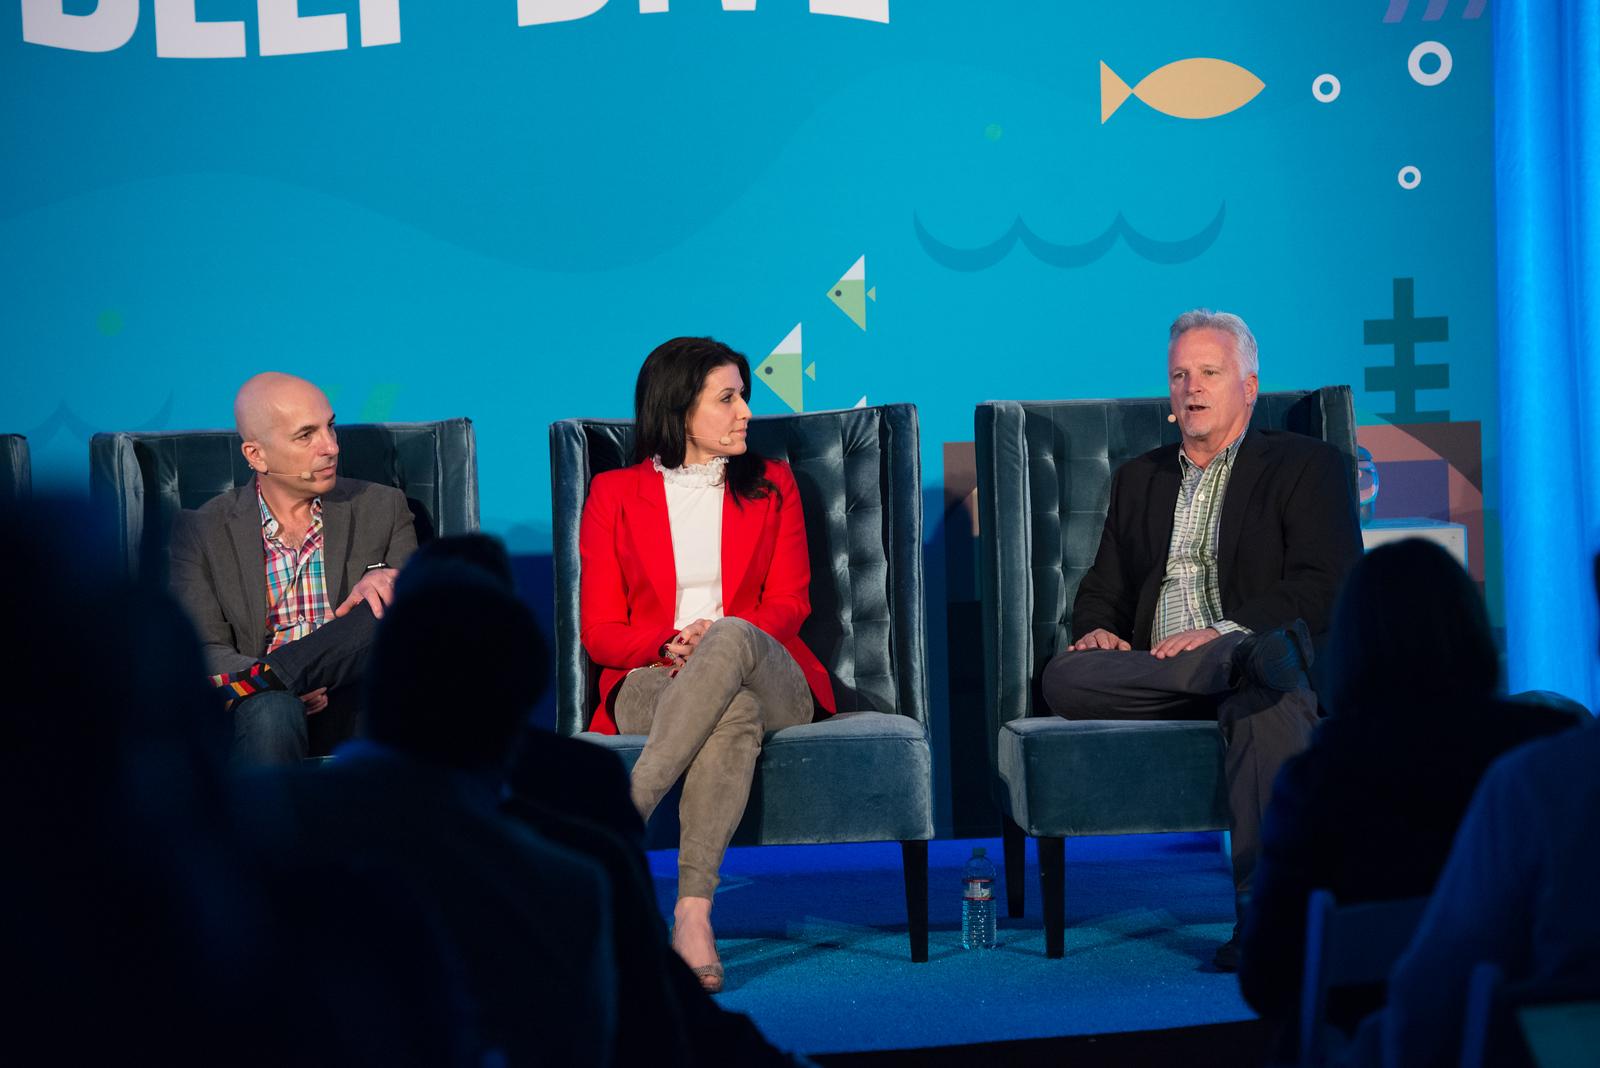 Demystifying AppExchange: 5 Insider Tips for Success Ian Dunckel SENIOR PRODUCT MARKETING MANAGER / SALESFORCE  Gadi Shamia COO / TALKDESK  Amanda Kahlow FOUNDER & CEO / 6SENSE Ray Hein FOUNDER & CEO / PROPEL